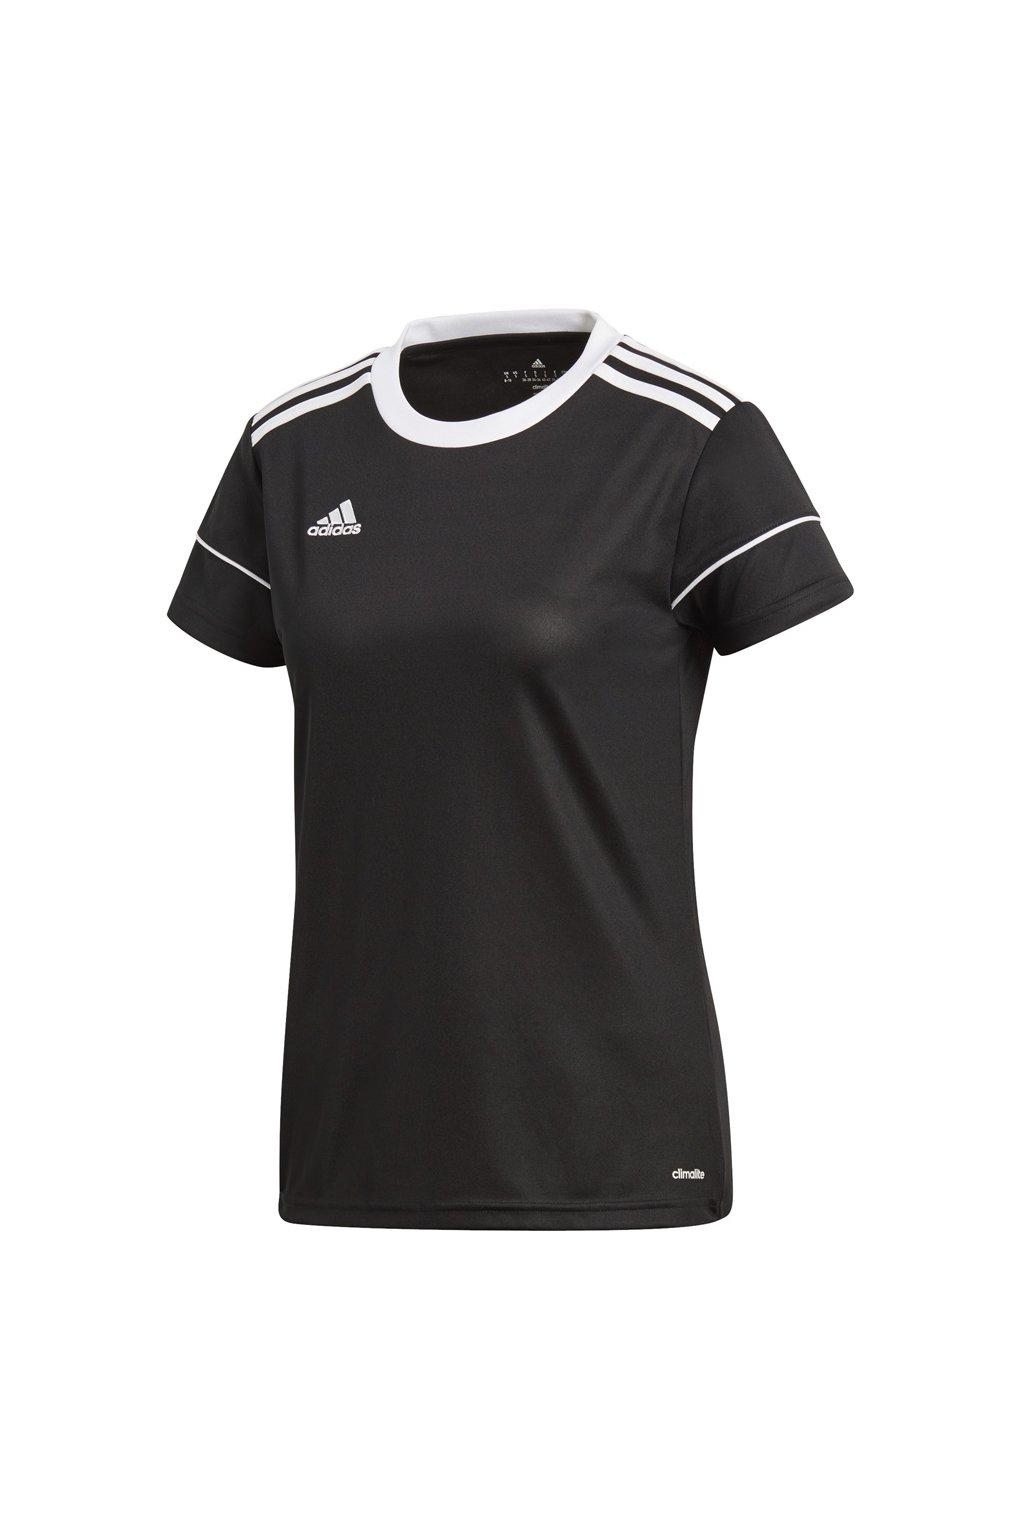 Dámske tričko adidas Squadra 17 Jersey Women čierne BJ9202